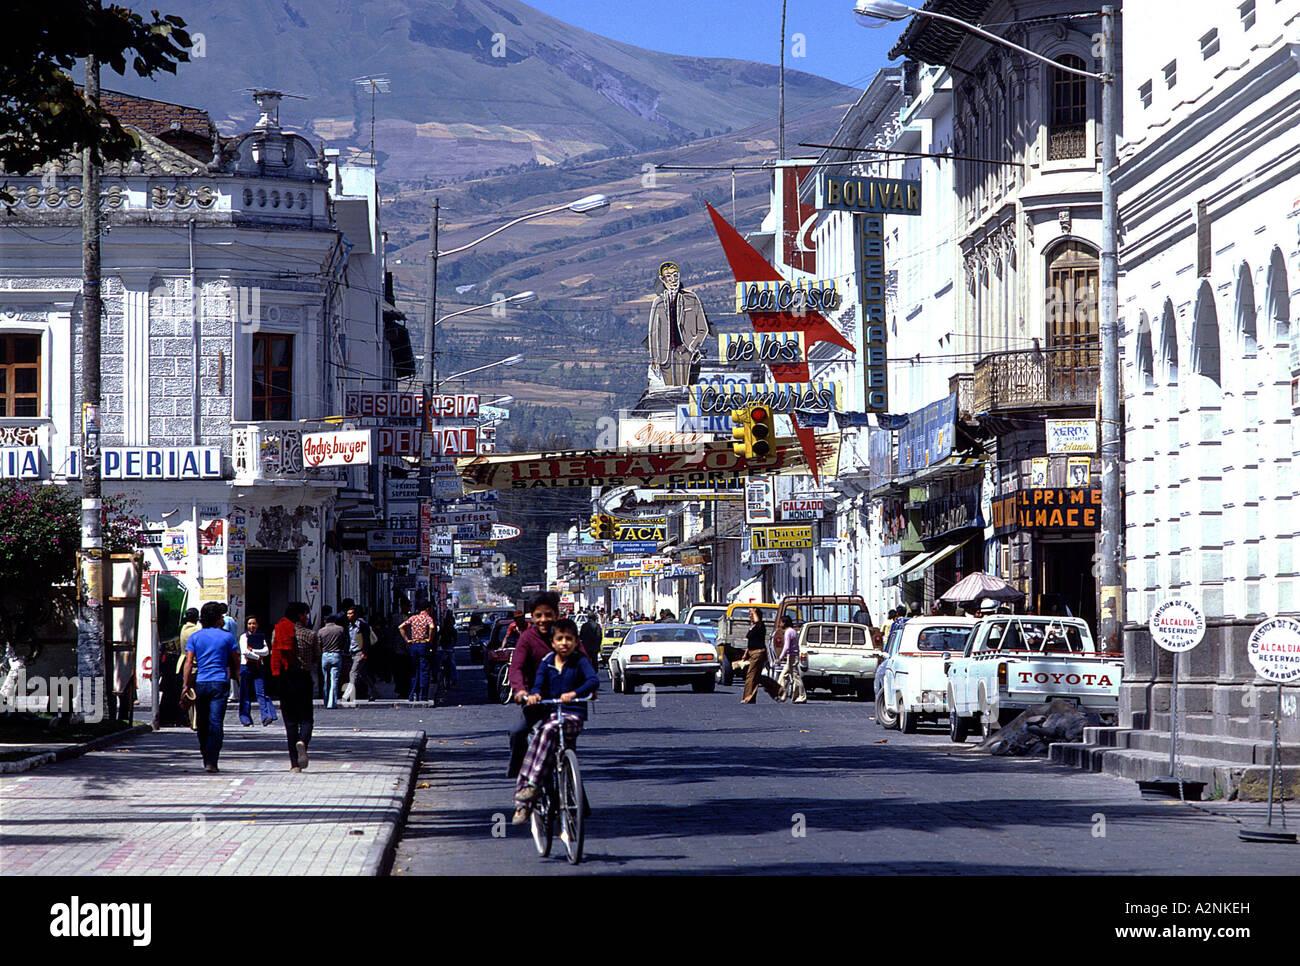 People on street in city, Ibarra, Ecuador - Stock Image